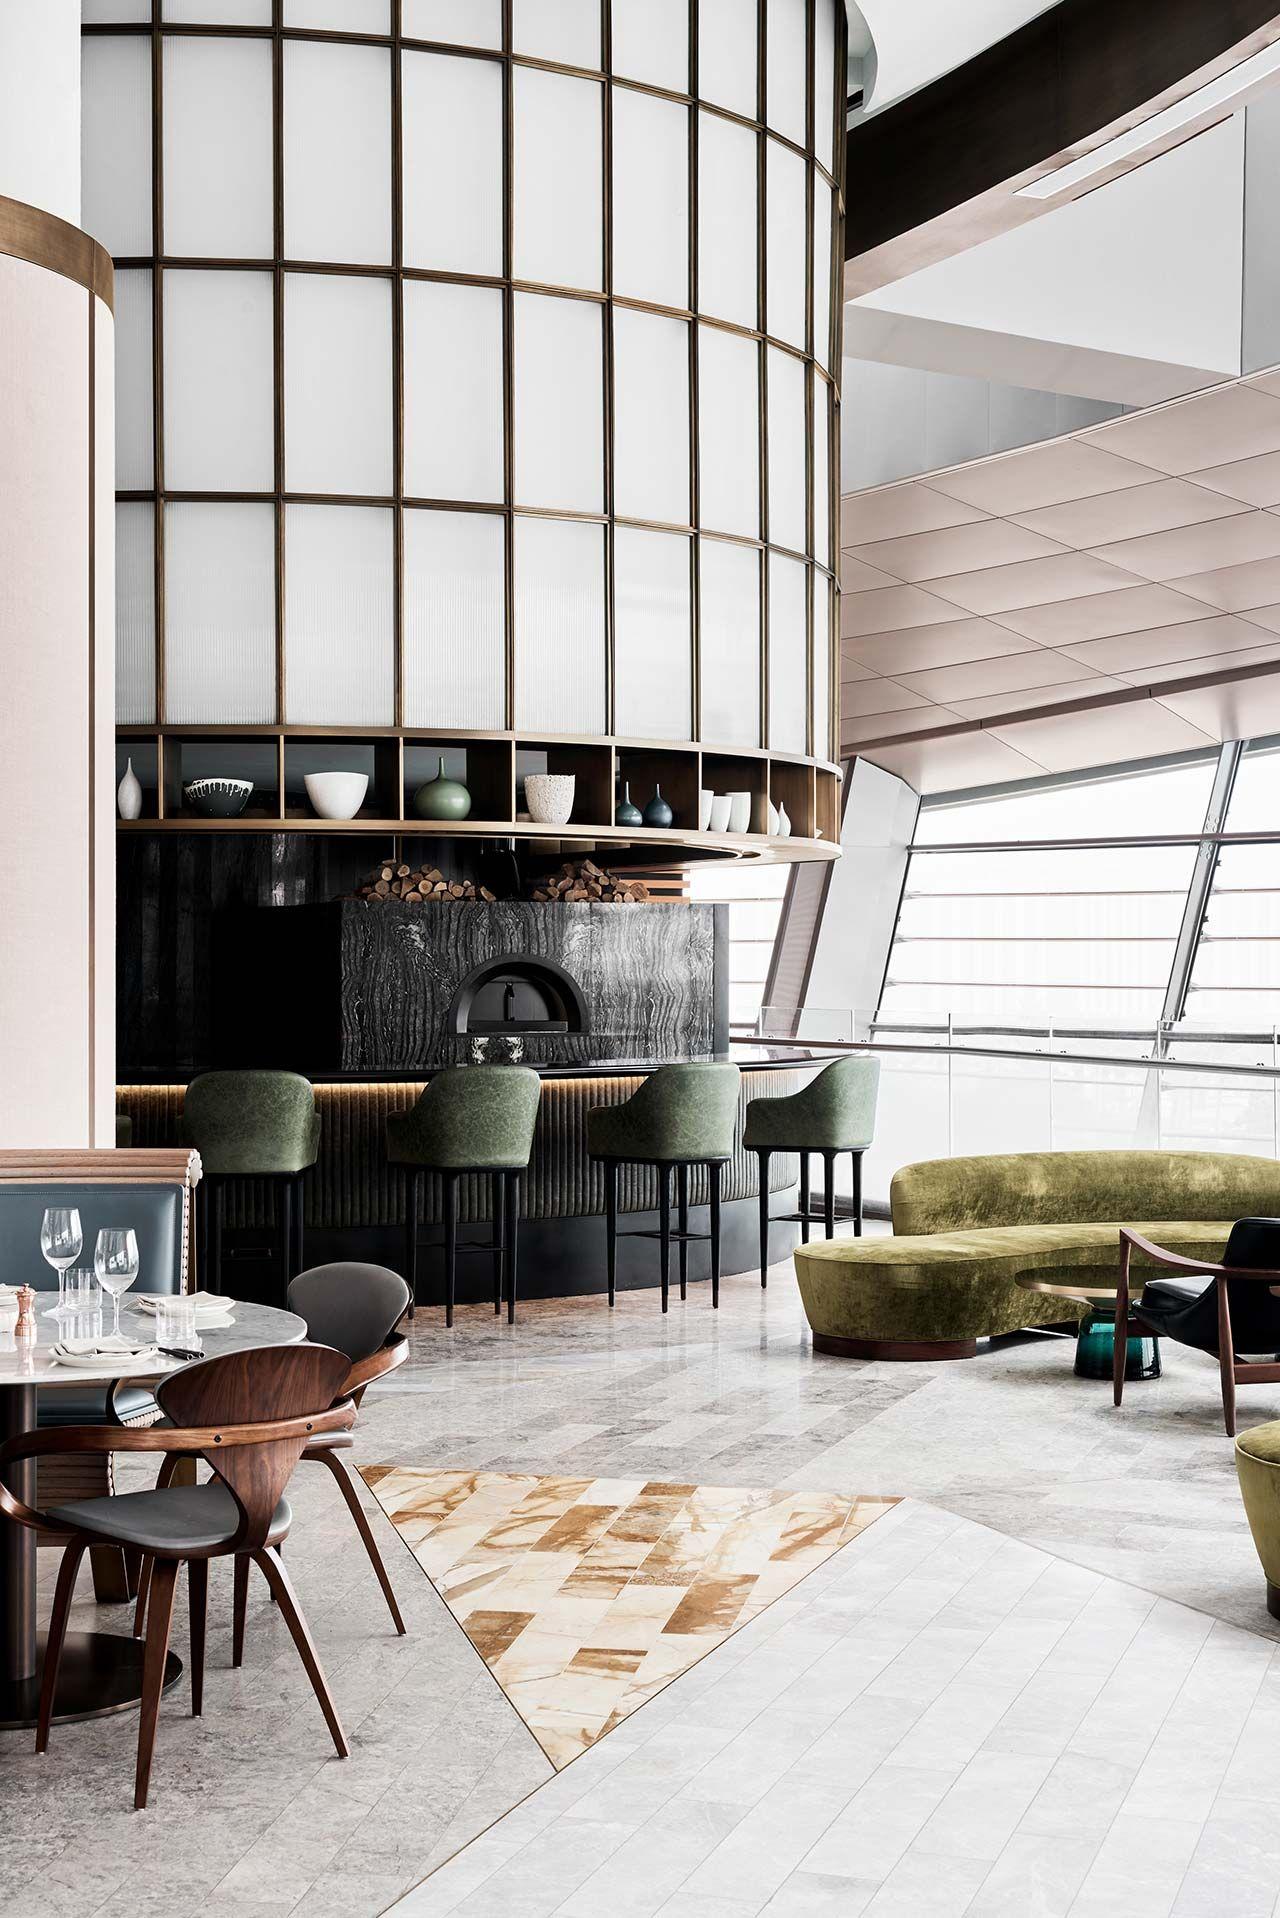 Sean Connolly at Dubai Opera | Restaurant Vibes | Pinterest | Opera ...